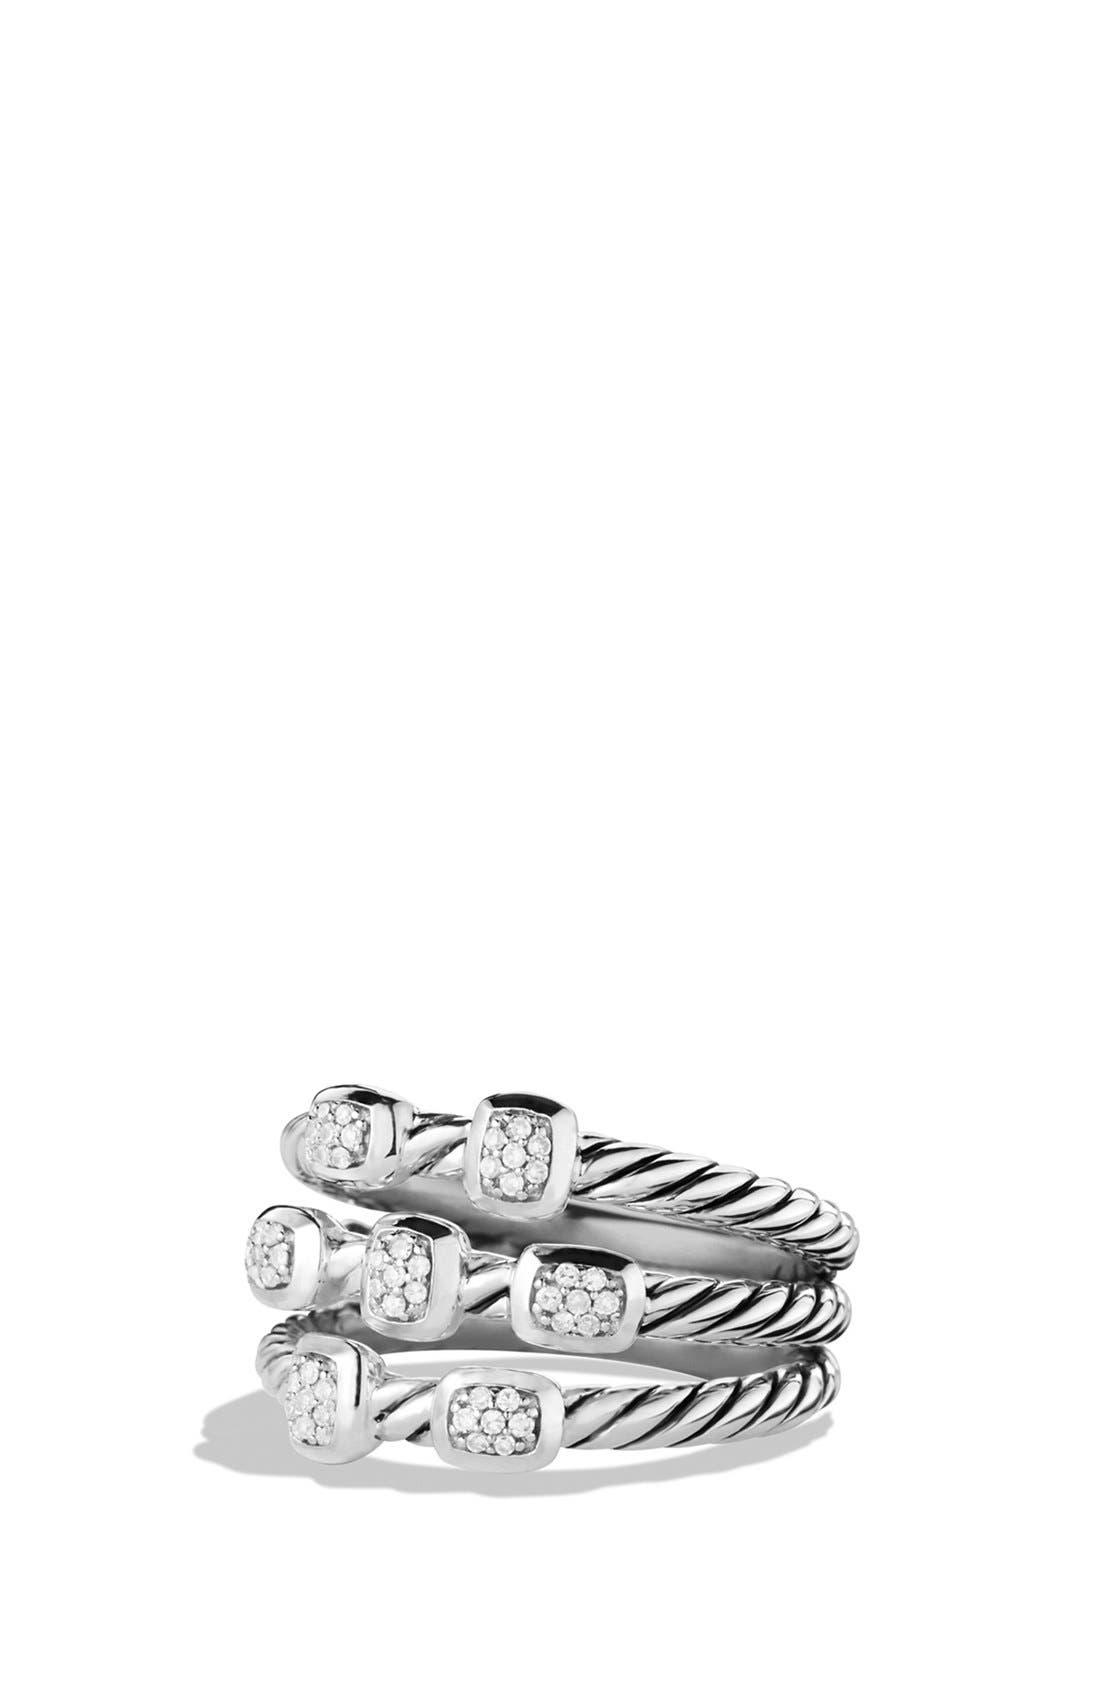 Main Image - David Yurman 'Confetti' Ring with Diamonds